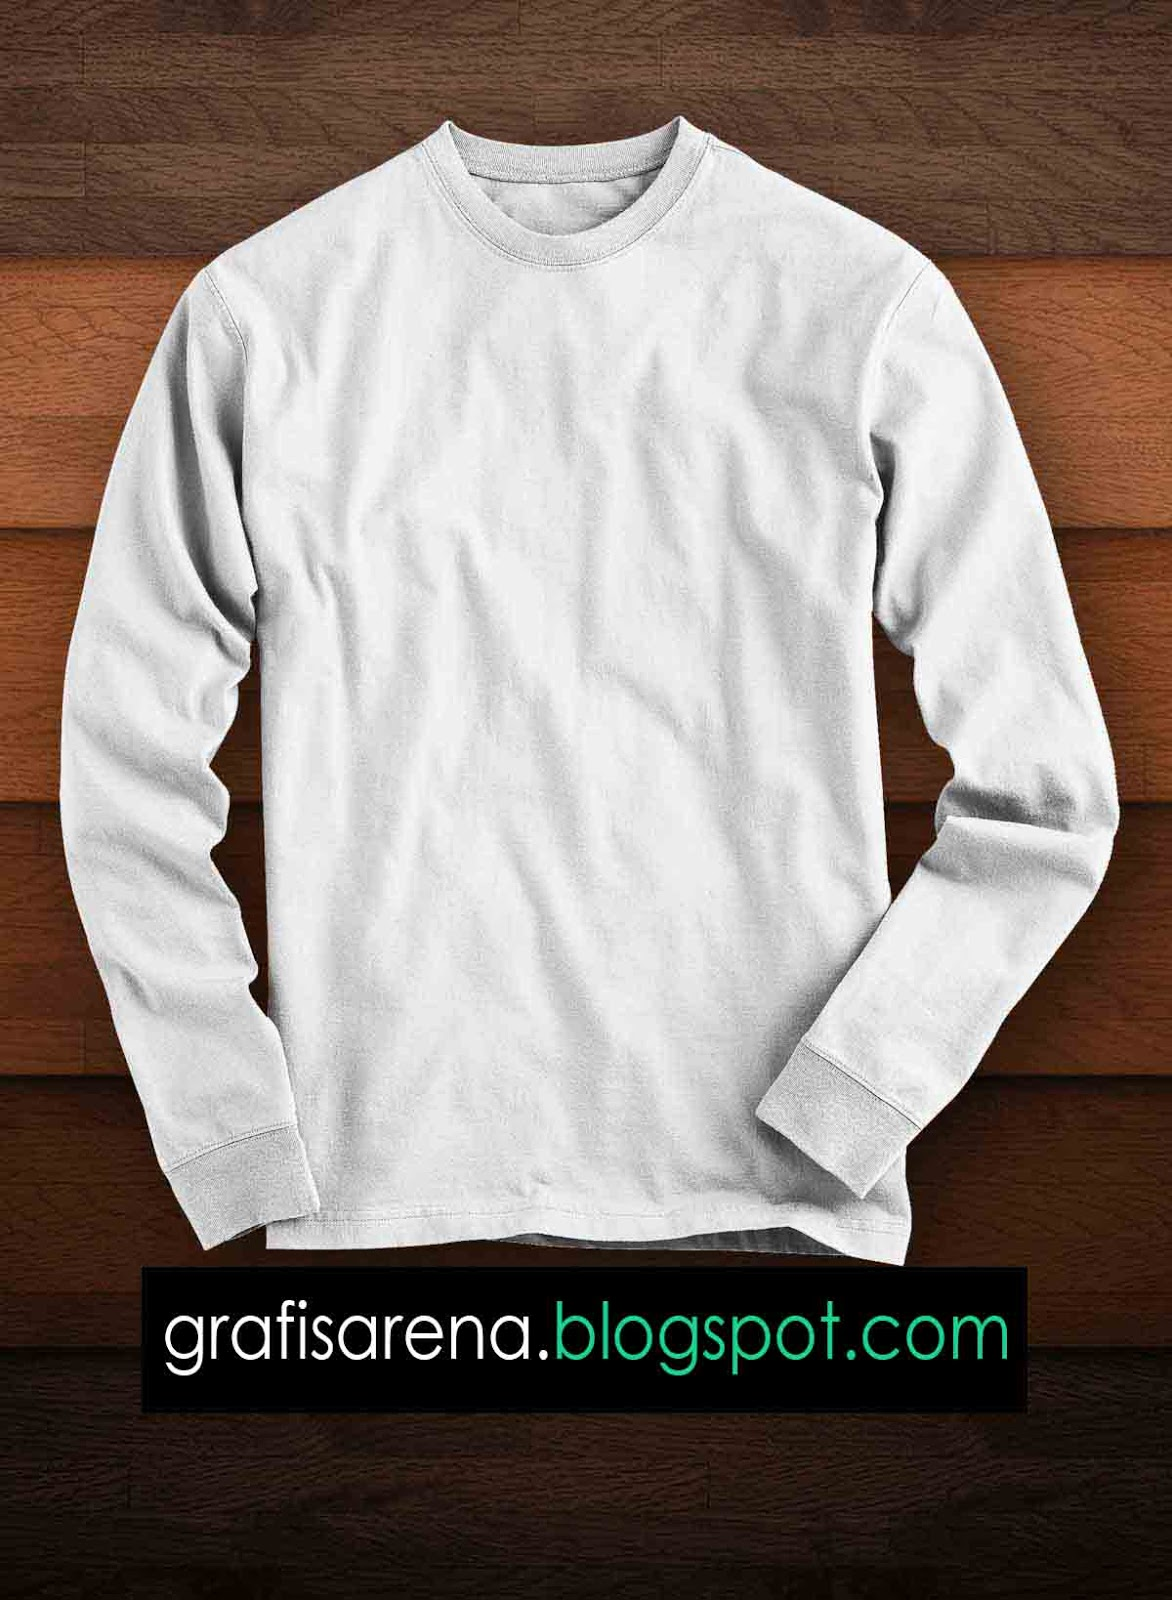 Template Kaos Lengan Panjang : template, lengan, panjang, Download, Template, Untuk, Photoshop